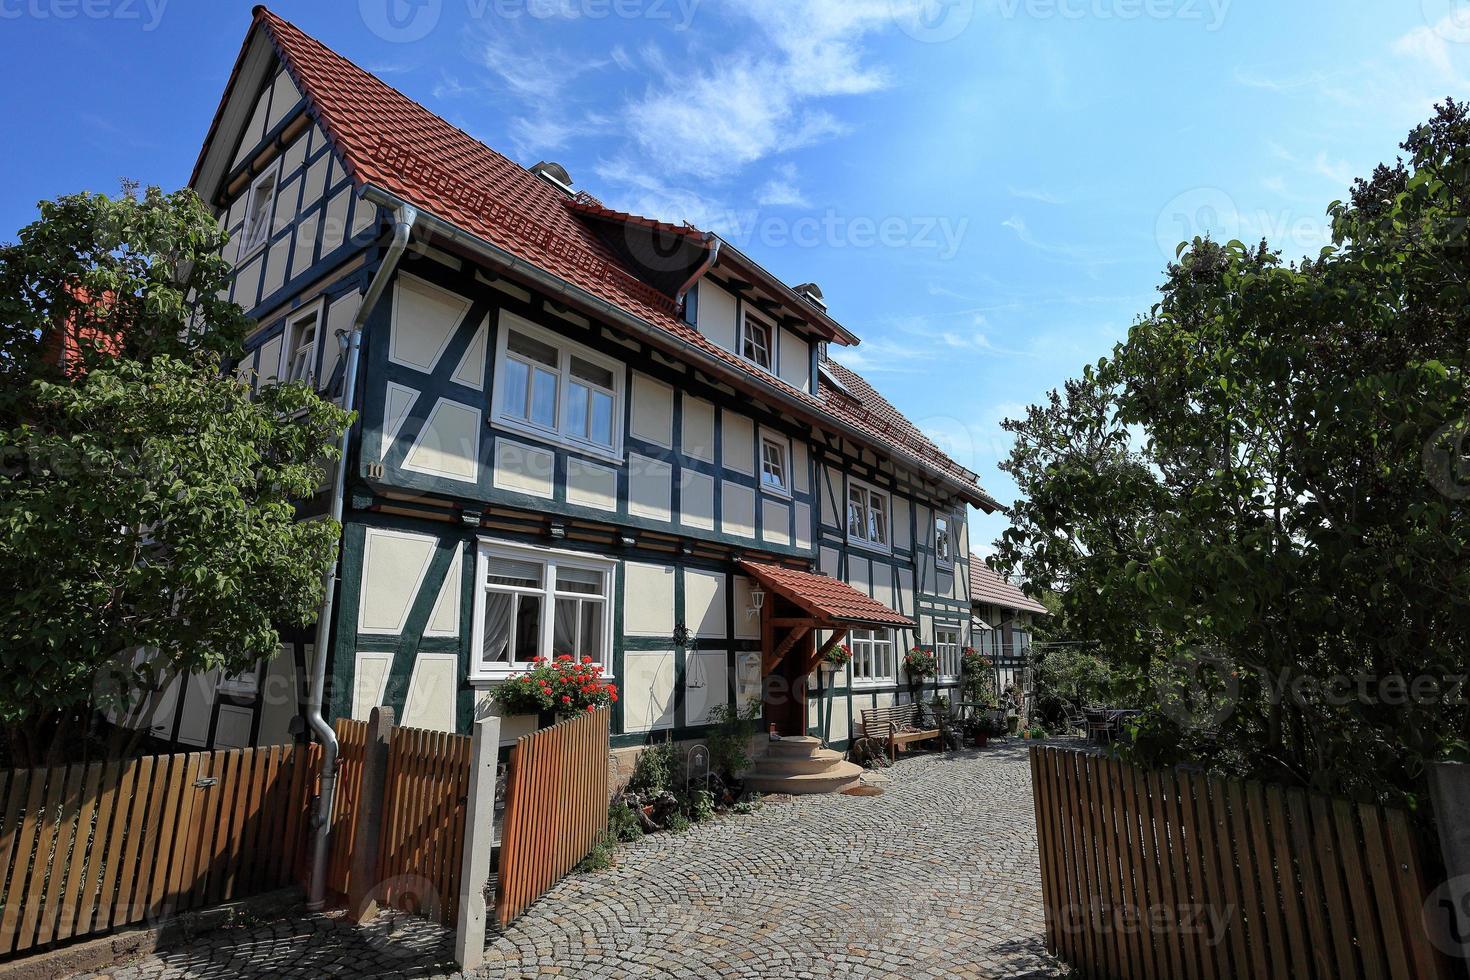 fachwerkerhäuser en hesse en deutschland photo